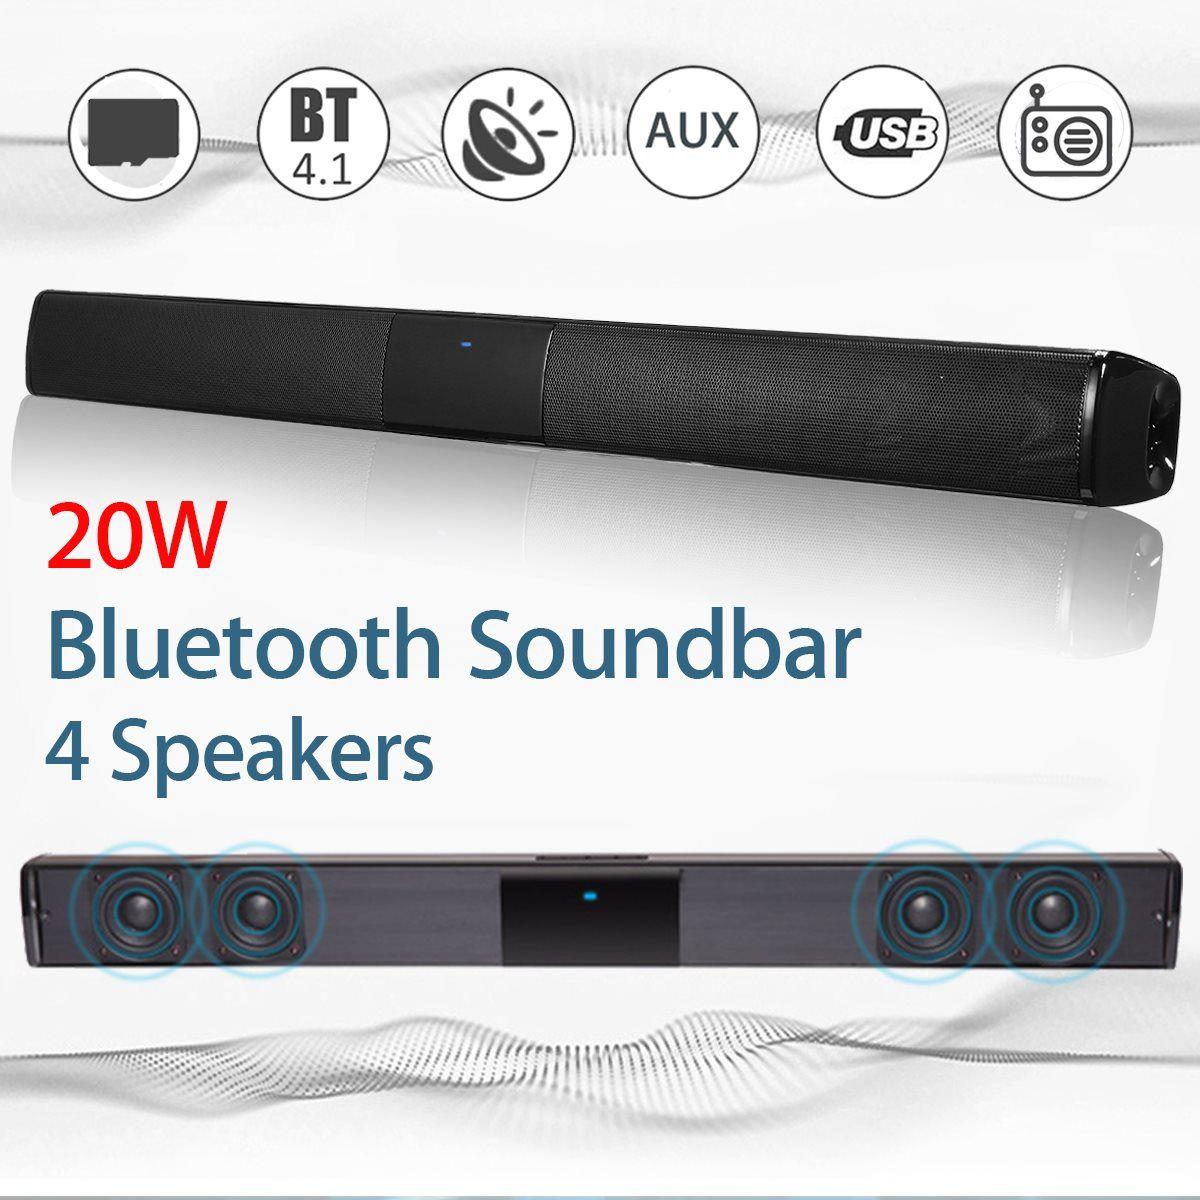 Kinco 20W Wireless Bluetooth Soundbar Stereo Hi-Fi Speaker Subwoofer FM TF AUX USB